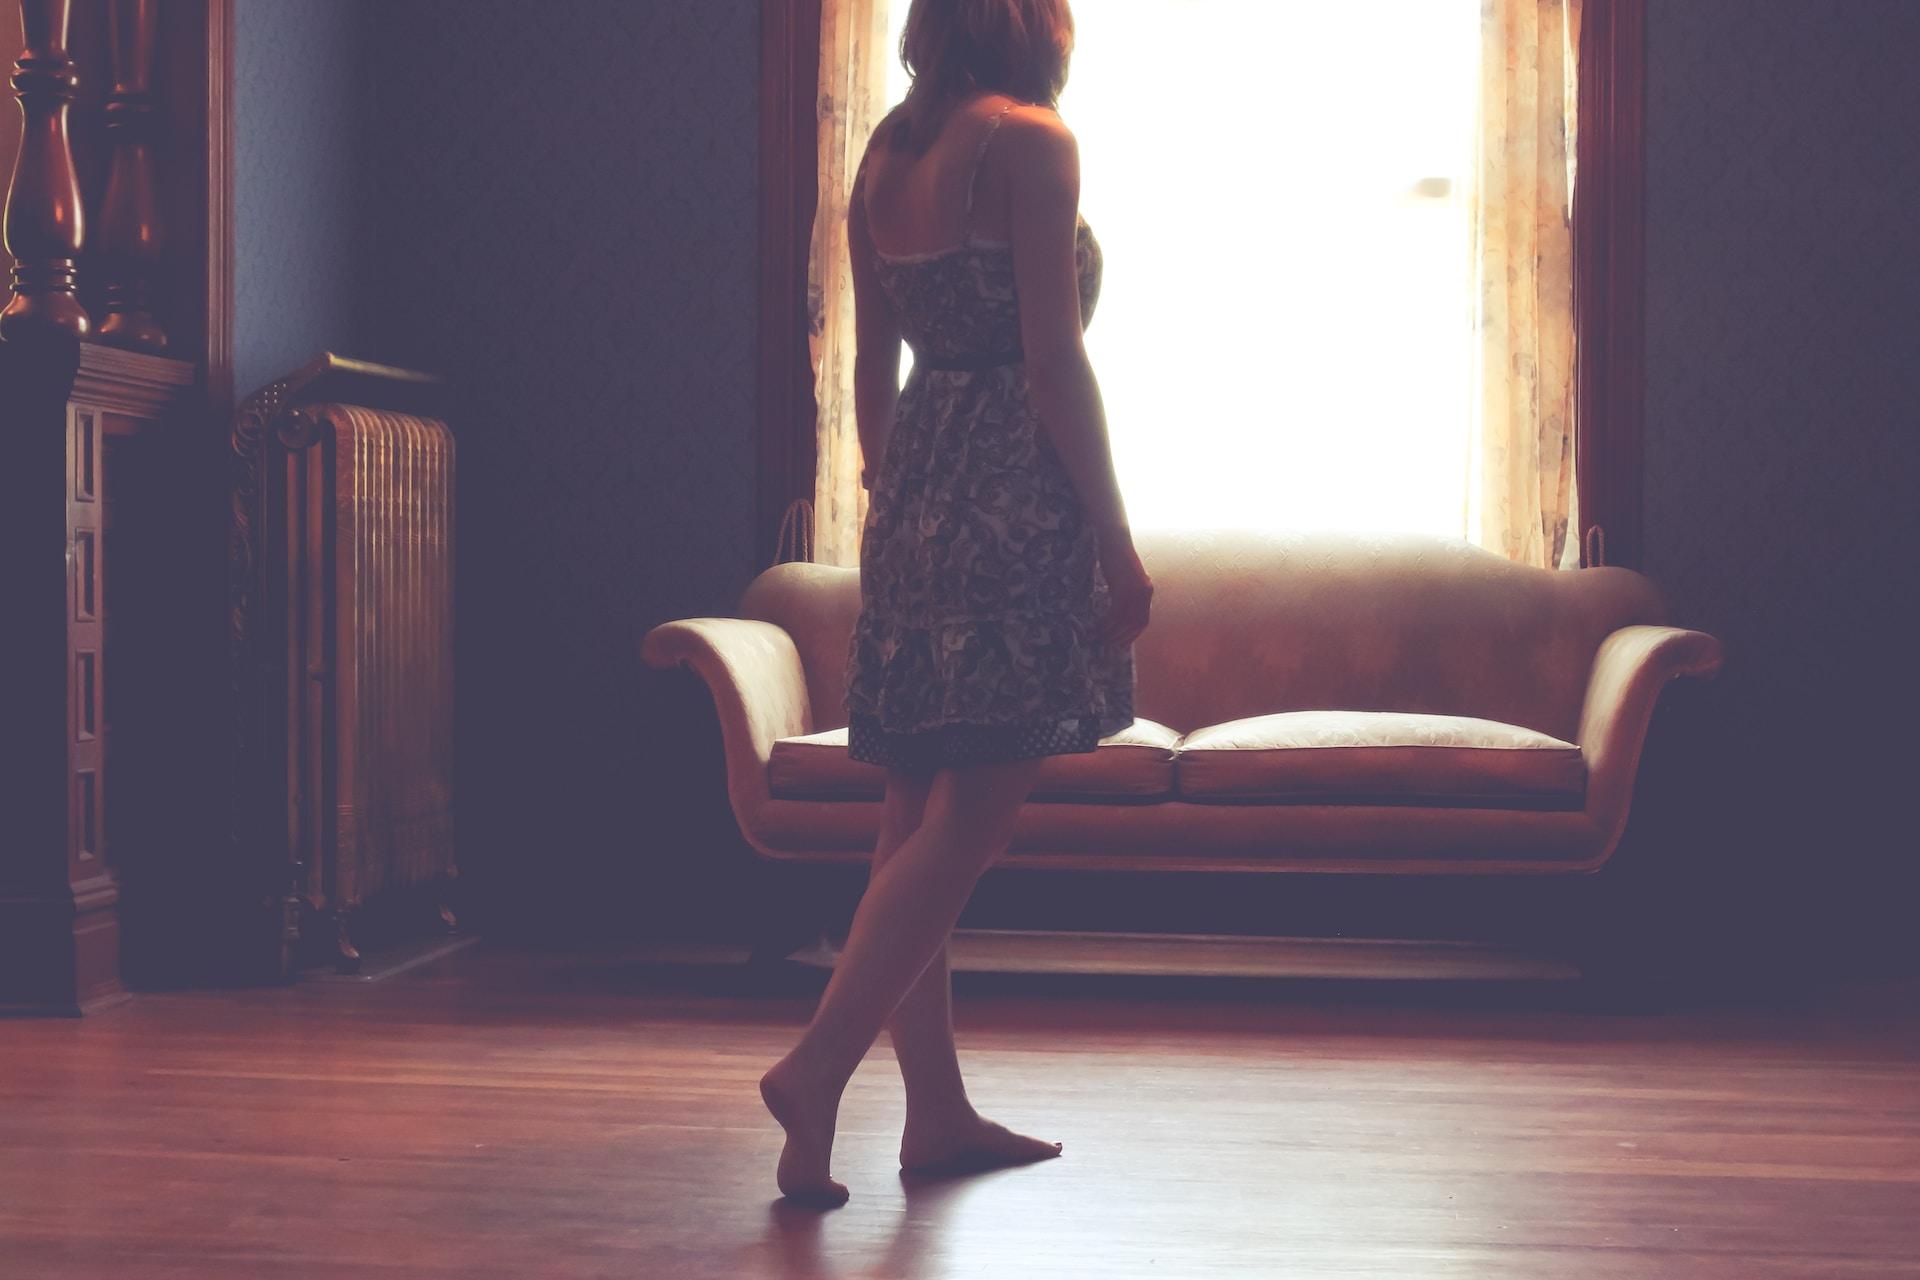 woman standing inside living room